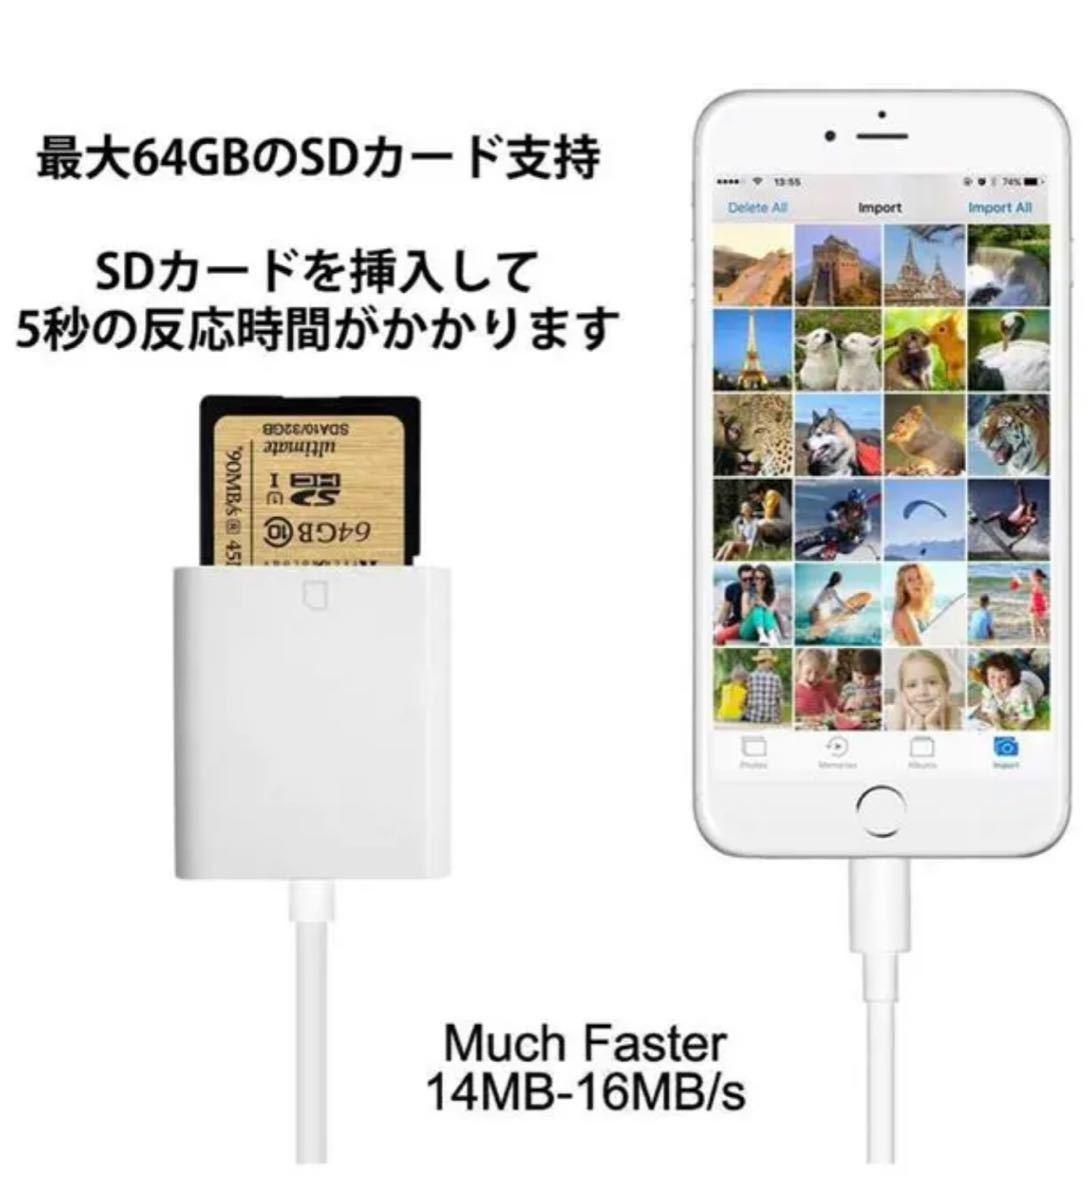 SDカードリーダー iOS対応 SDカードカメラリーダー高速な写真とビデオ転送